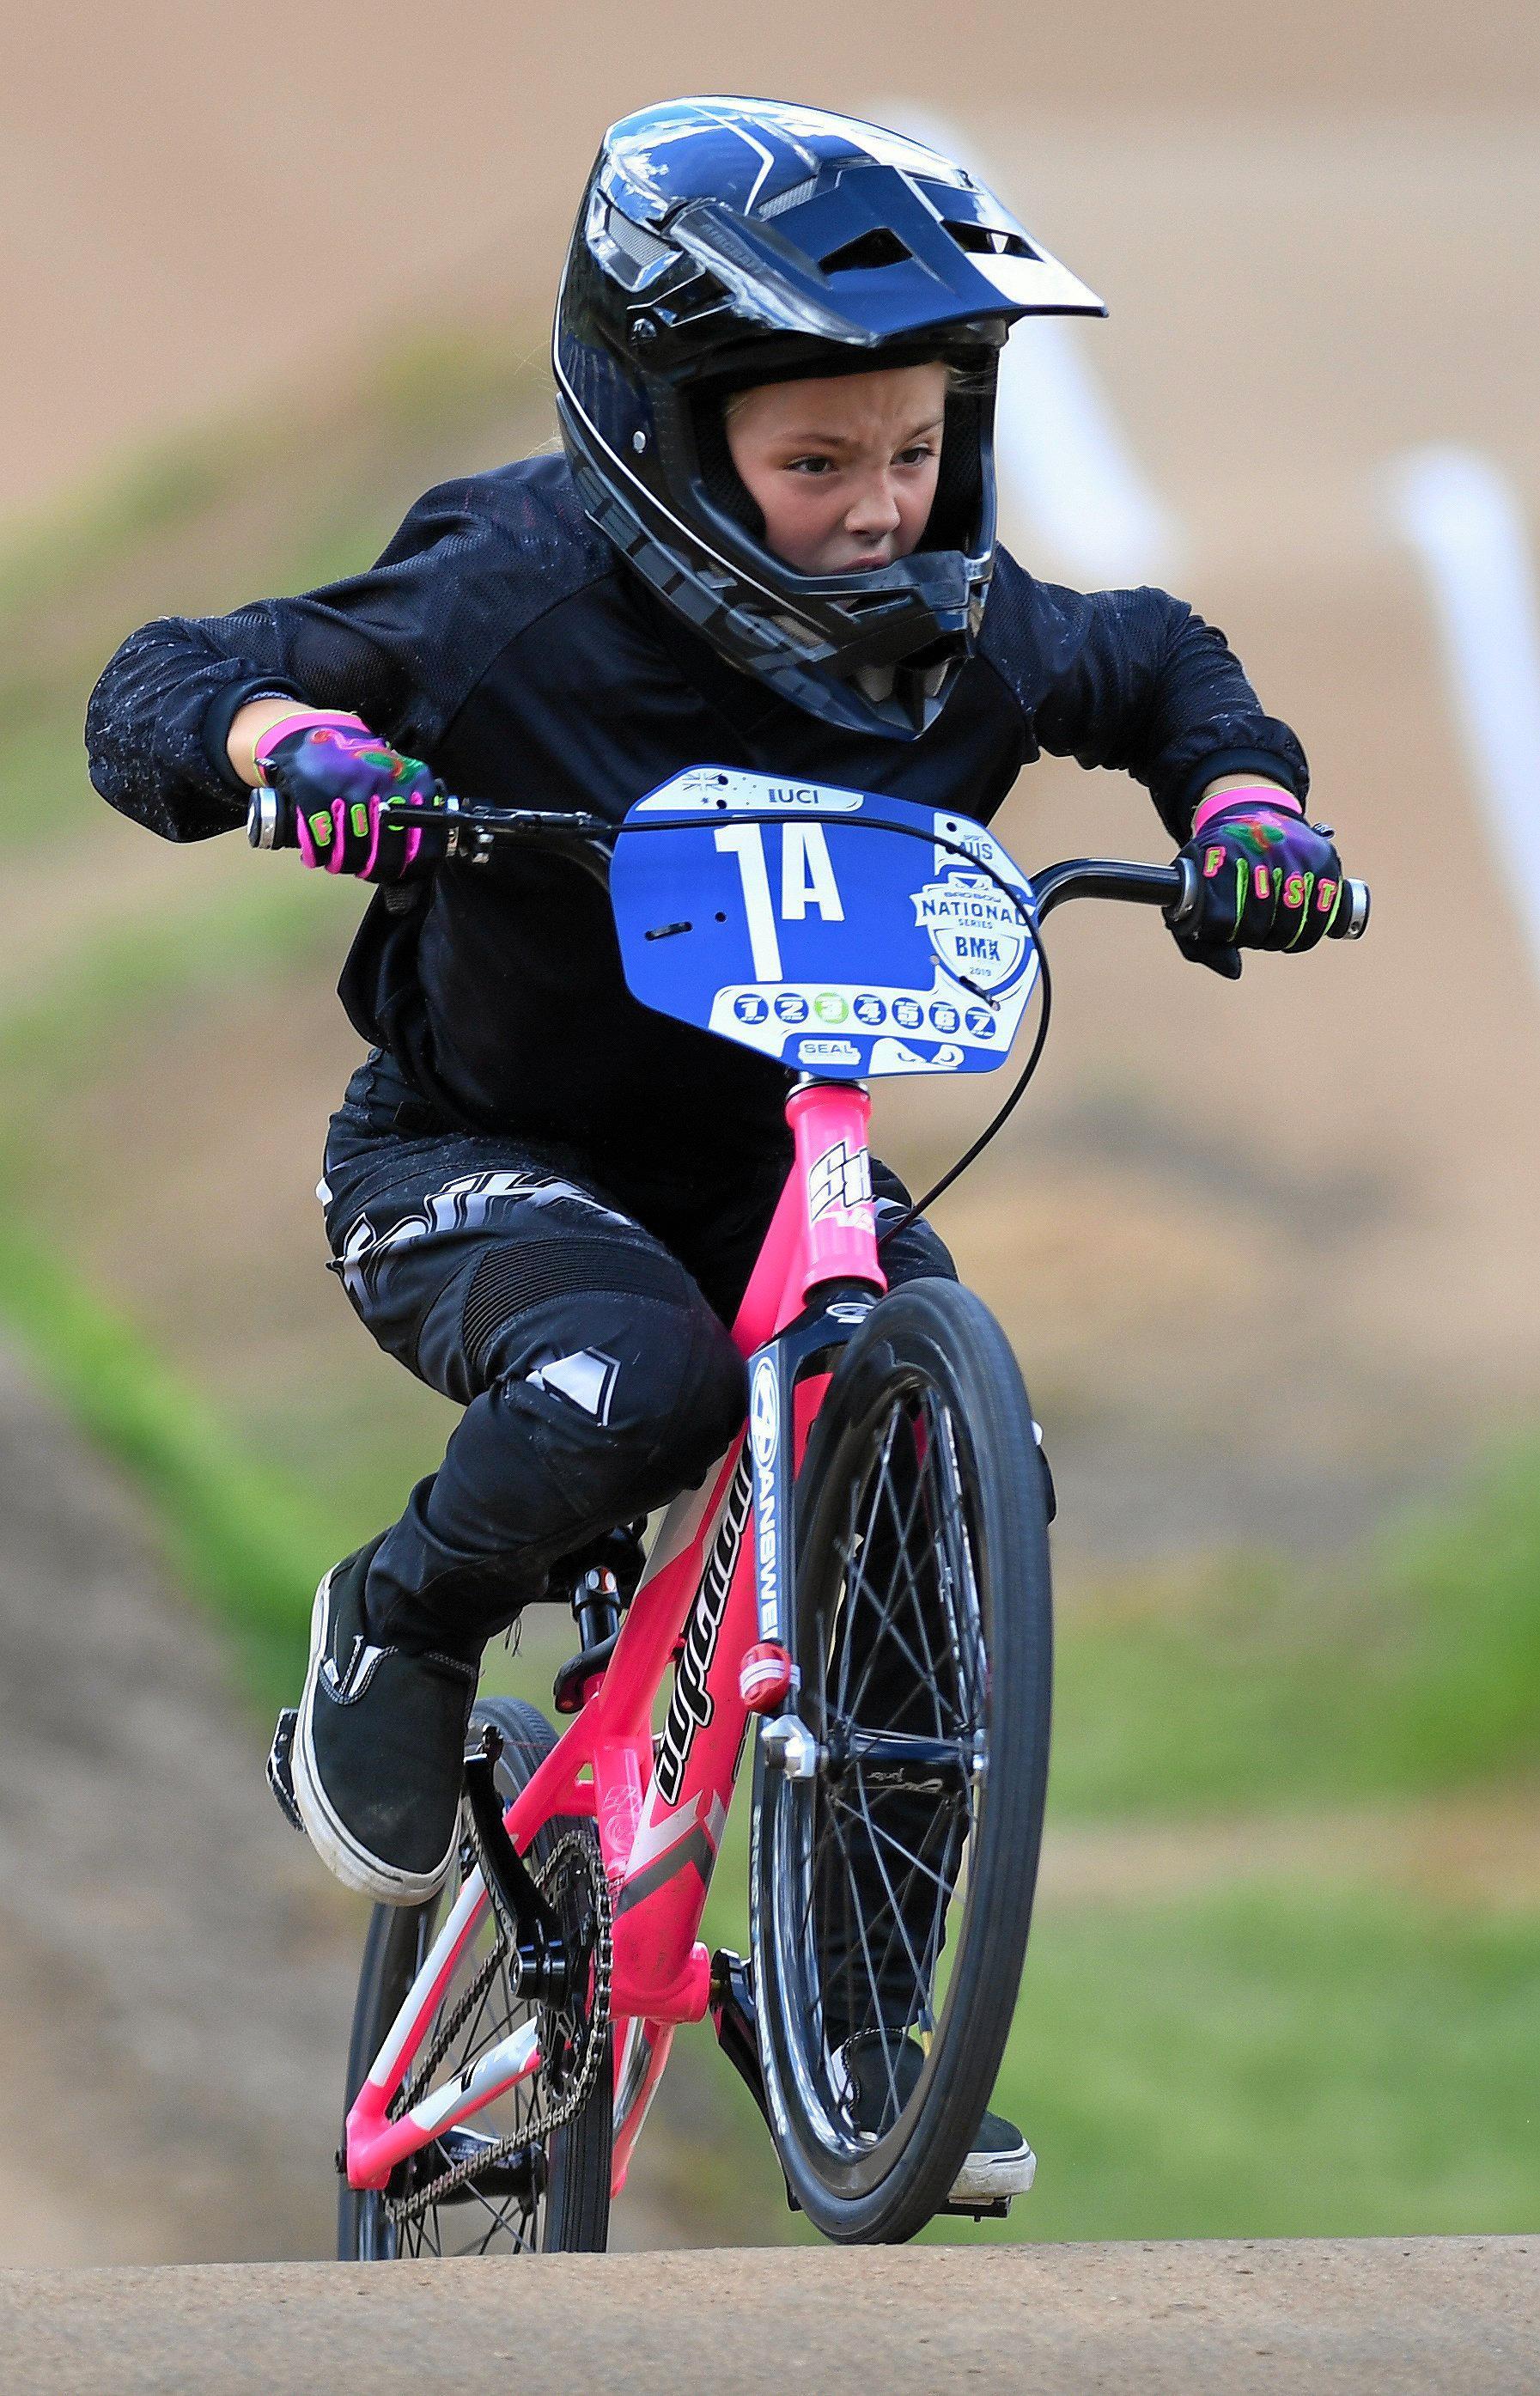 Sophia Preston  from the Ipswich West Moreton BMC Club  in action during the 2019 BMXA BAD BOY National Series at the Ipswich West Moreton BMC Club on Saturday.